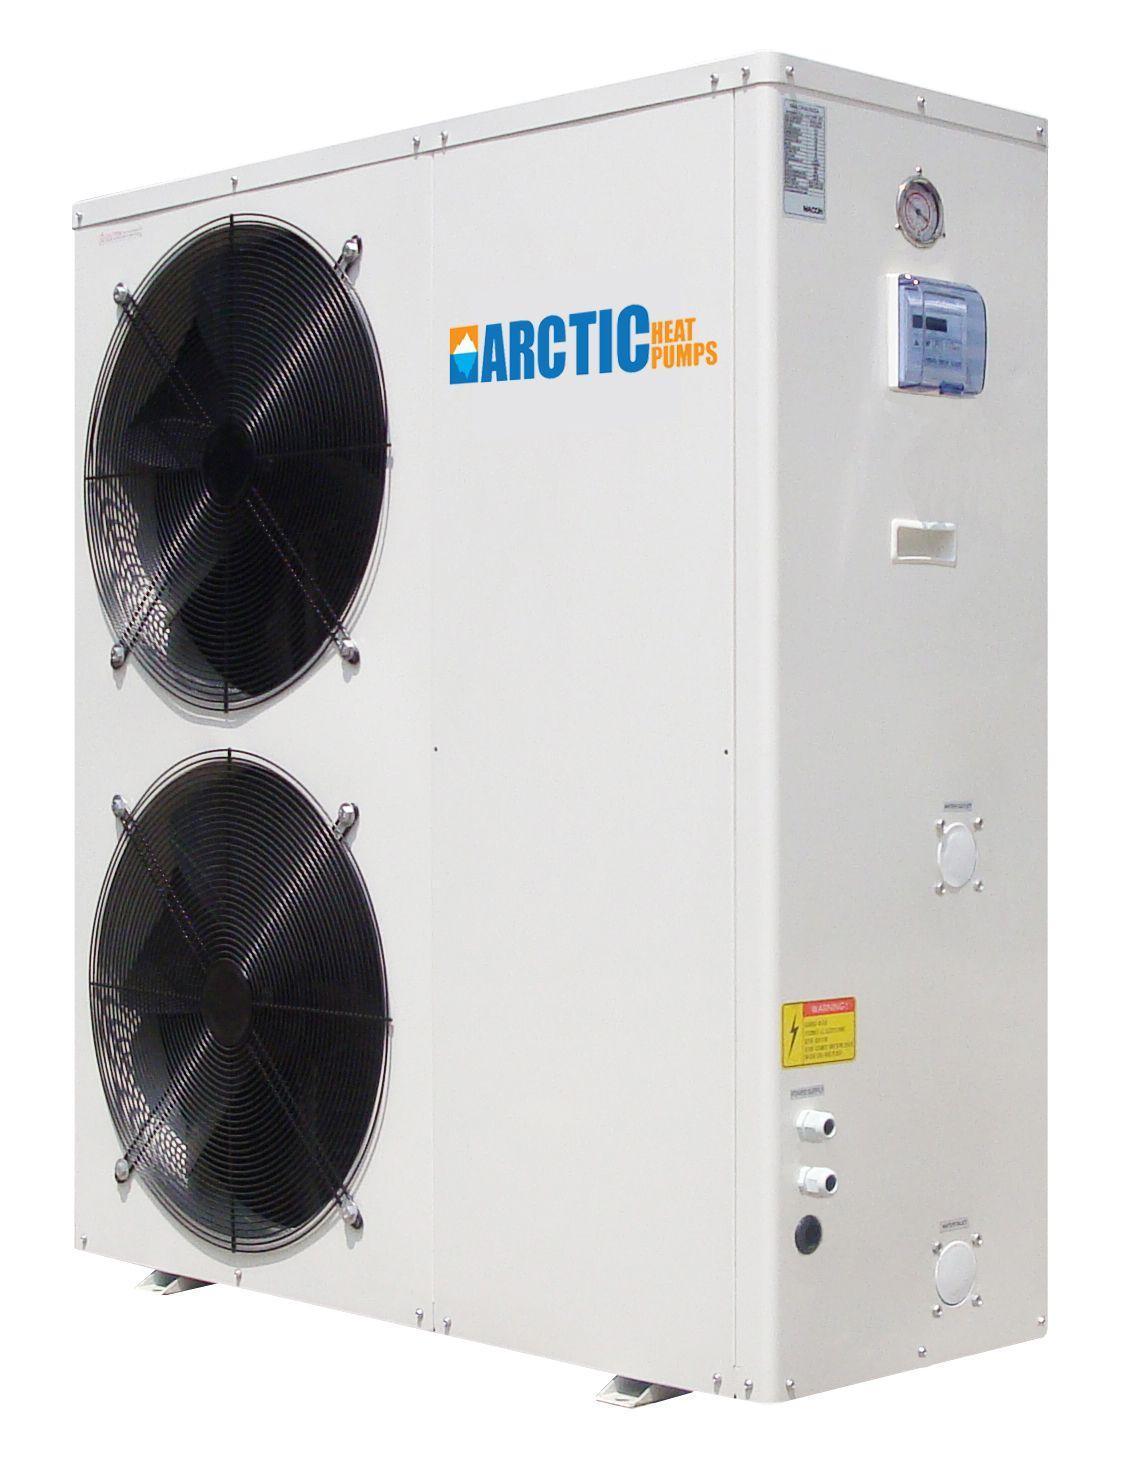 Arctic Heat Pump POOL-060ZA - 25 Kw - 85,000 BTU